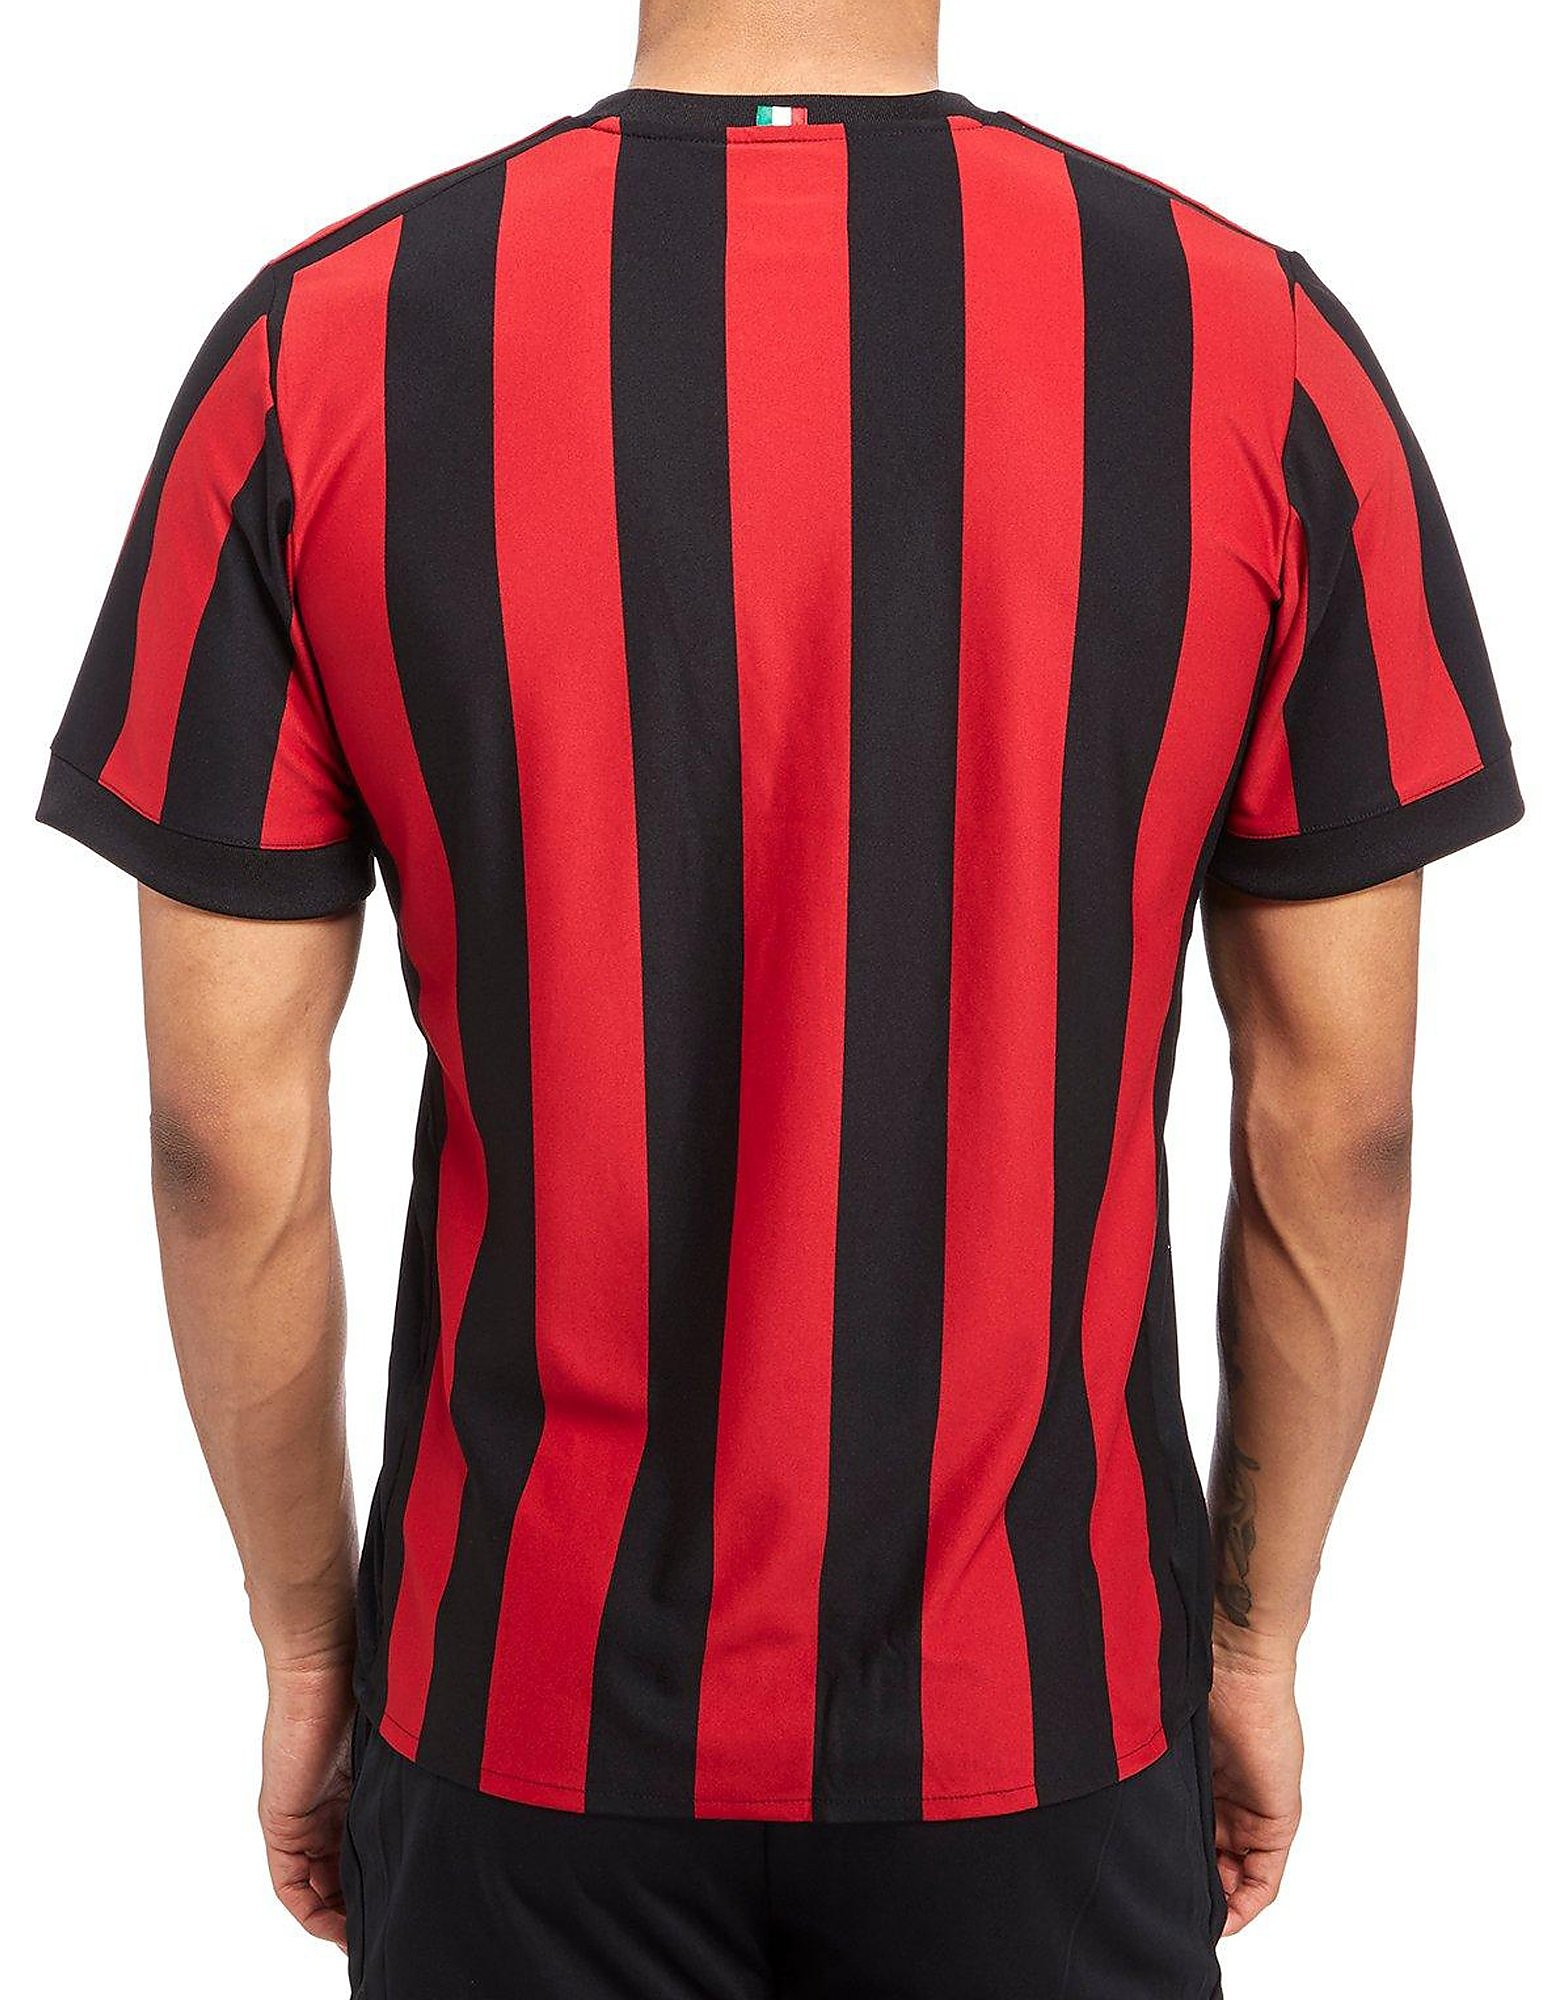 adidas AC Milan 2017/18 Home Shirt PRE ORDER